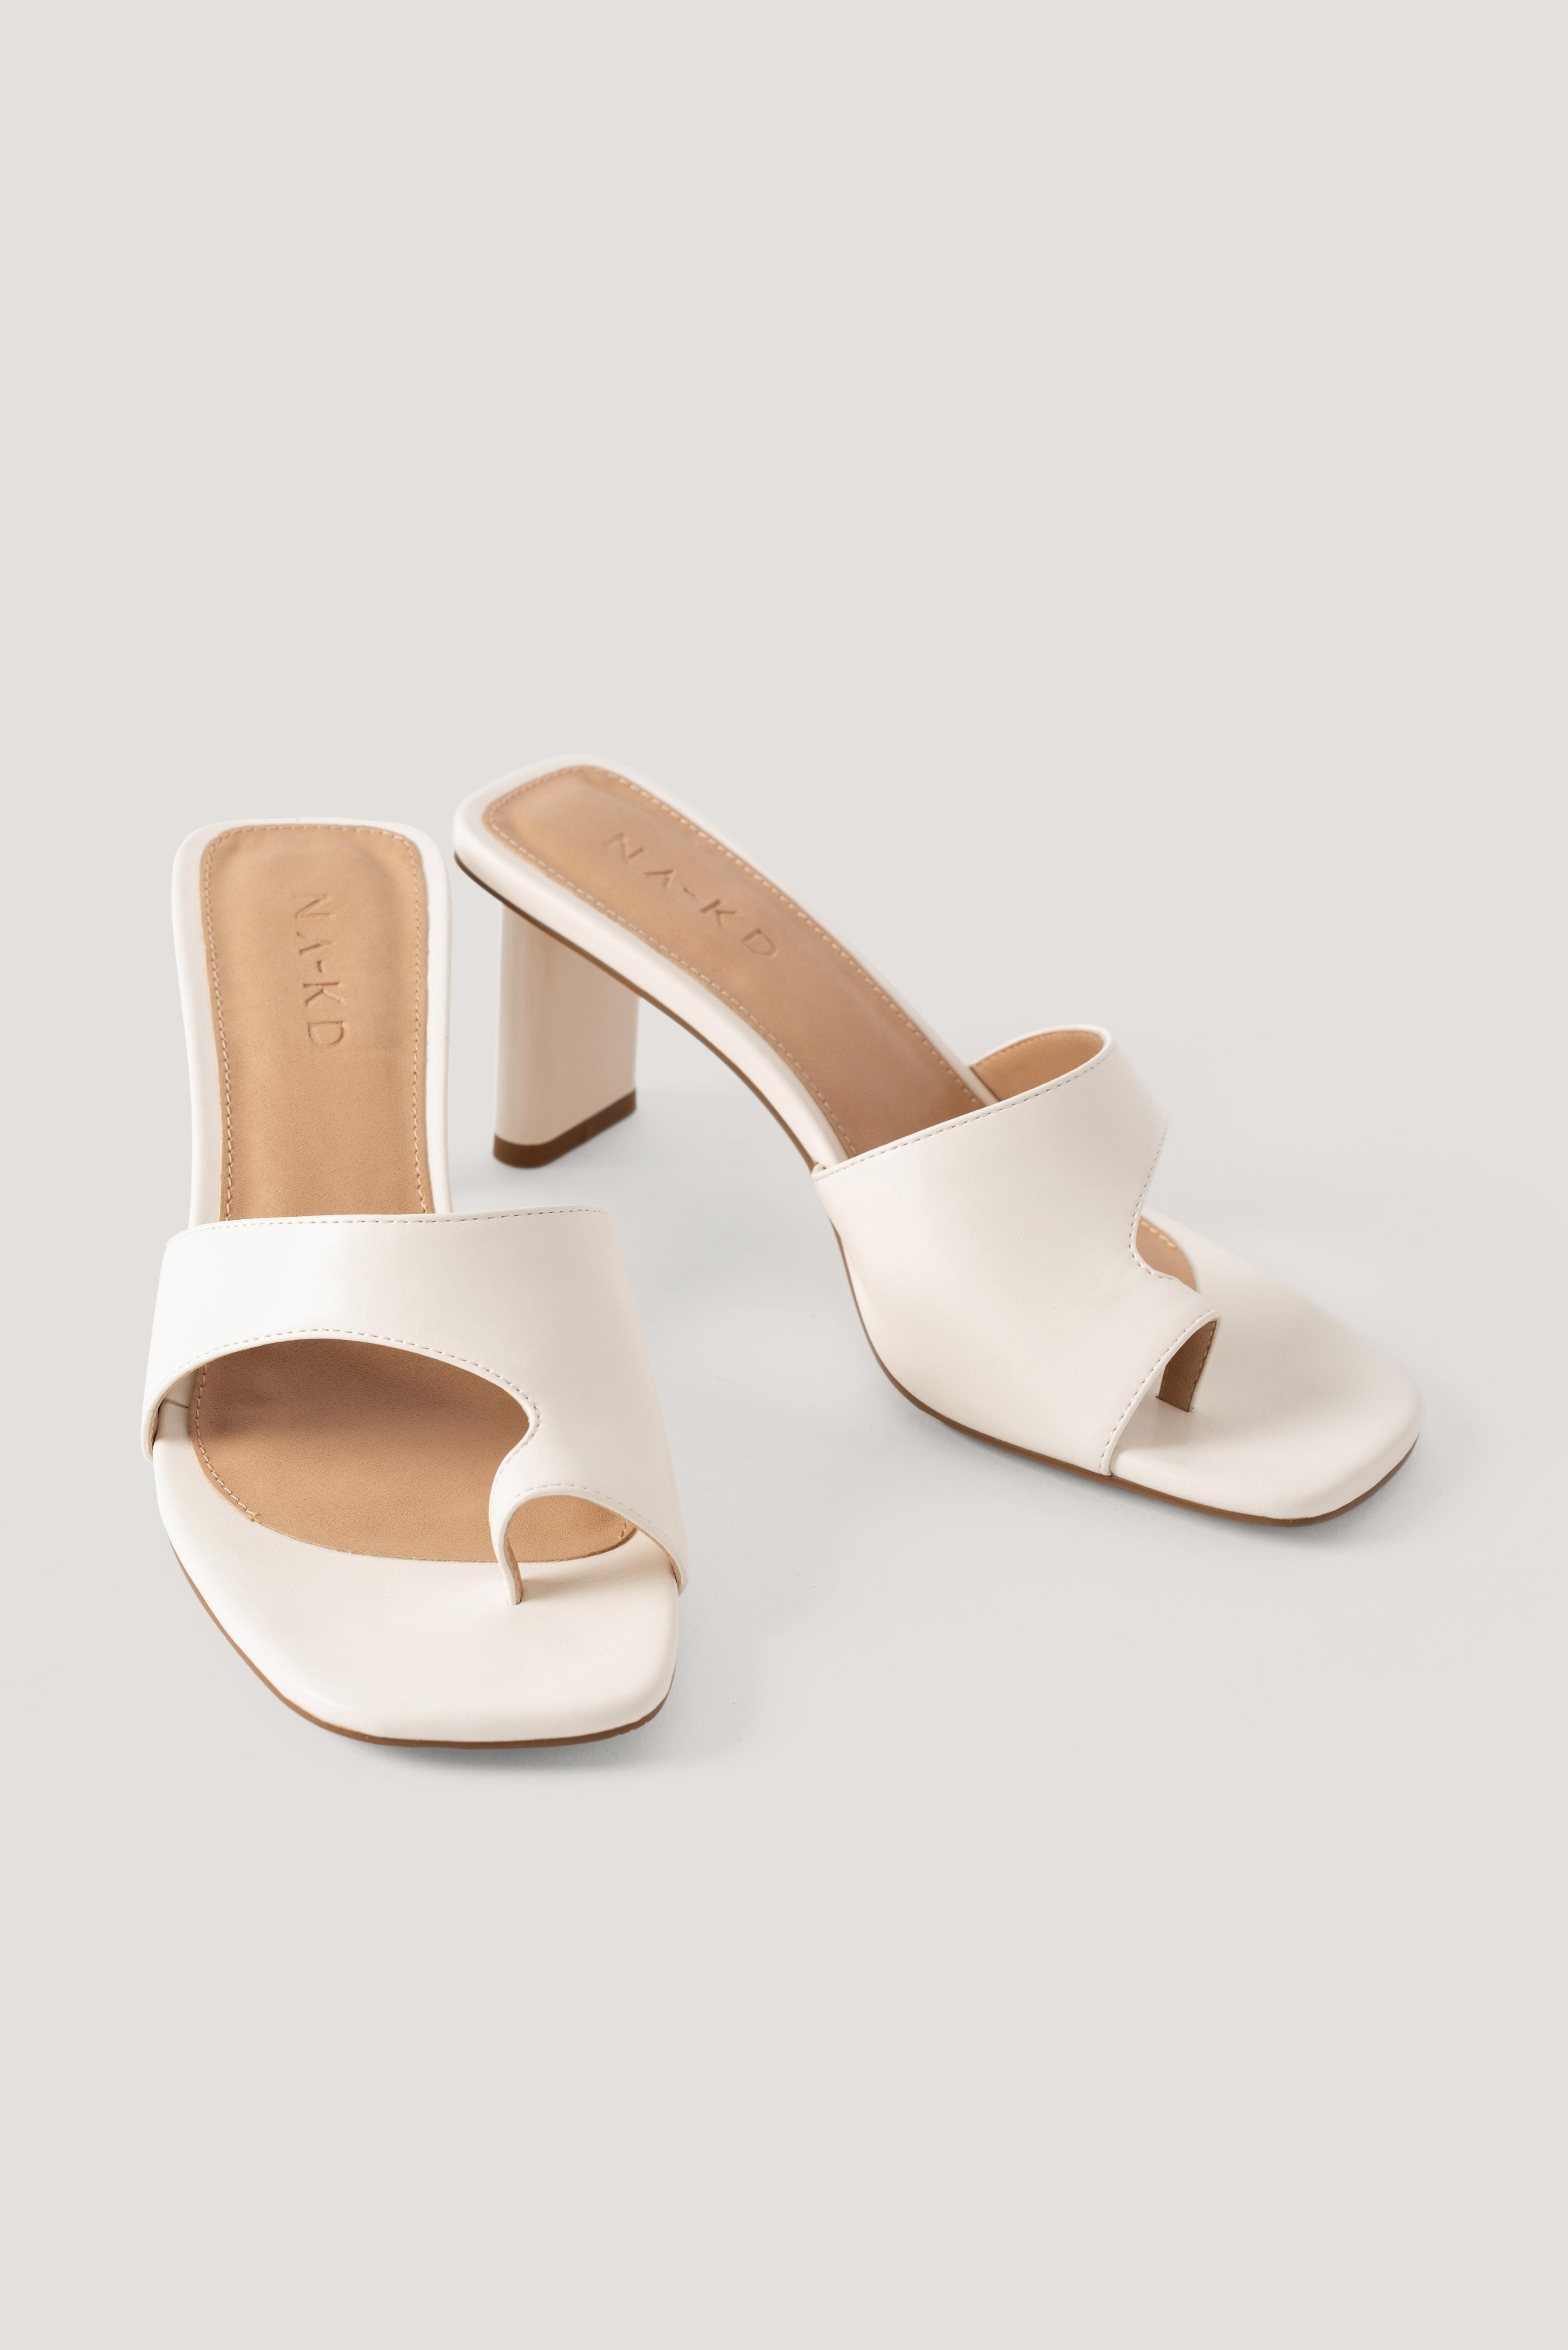 na-kd shoes -  Toe Strap Mules - White